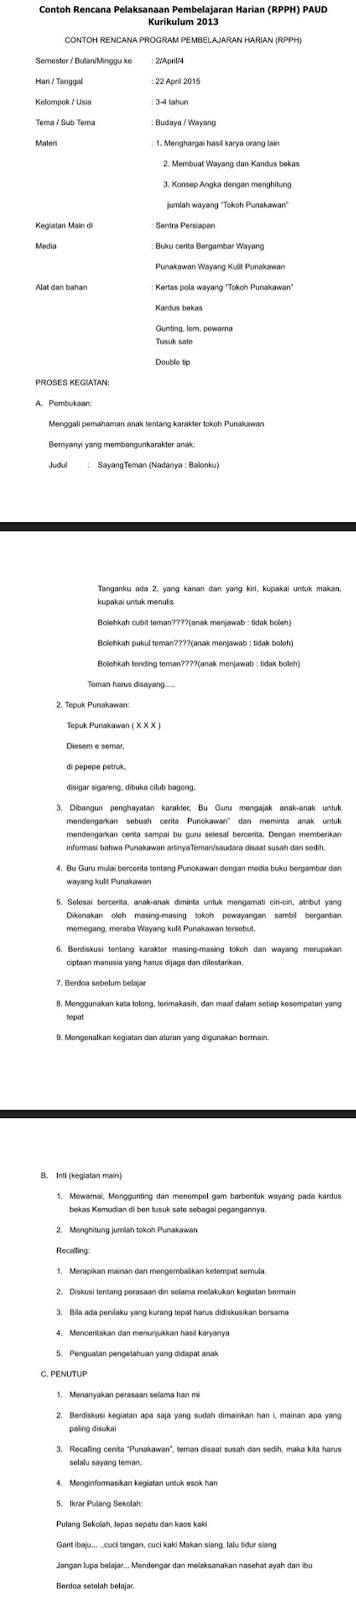 Contoh RPPH PAUD Kurikulum 2013 Usia 3-4 Tahun Kelompok A